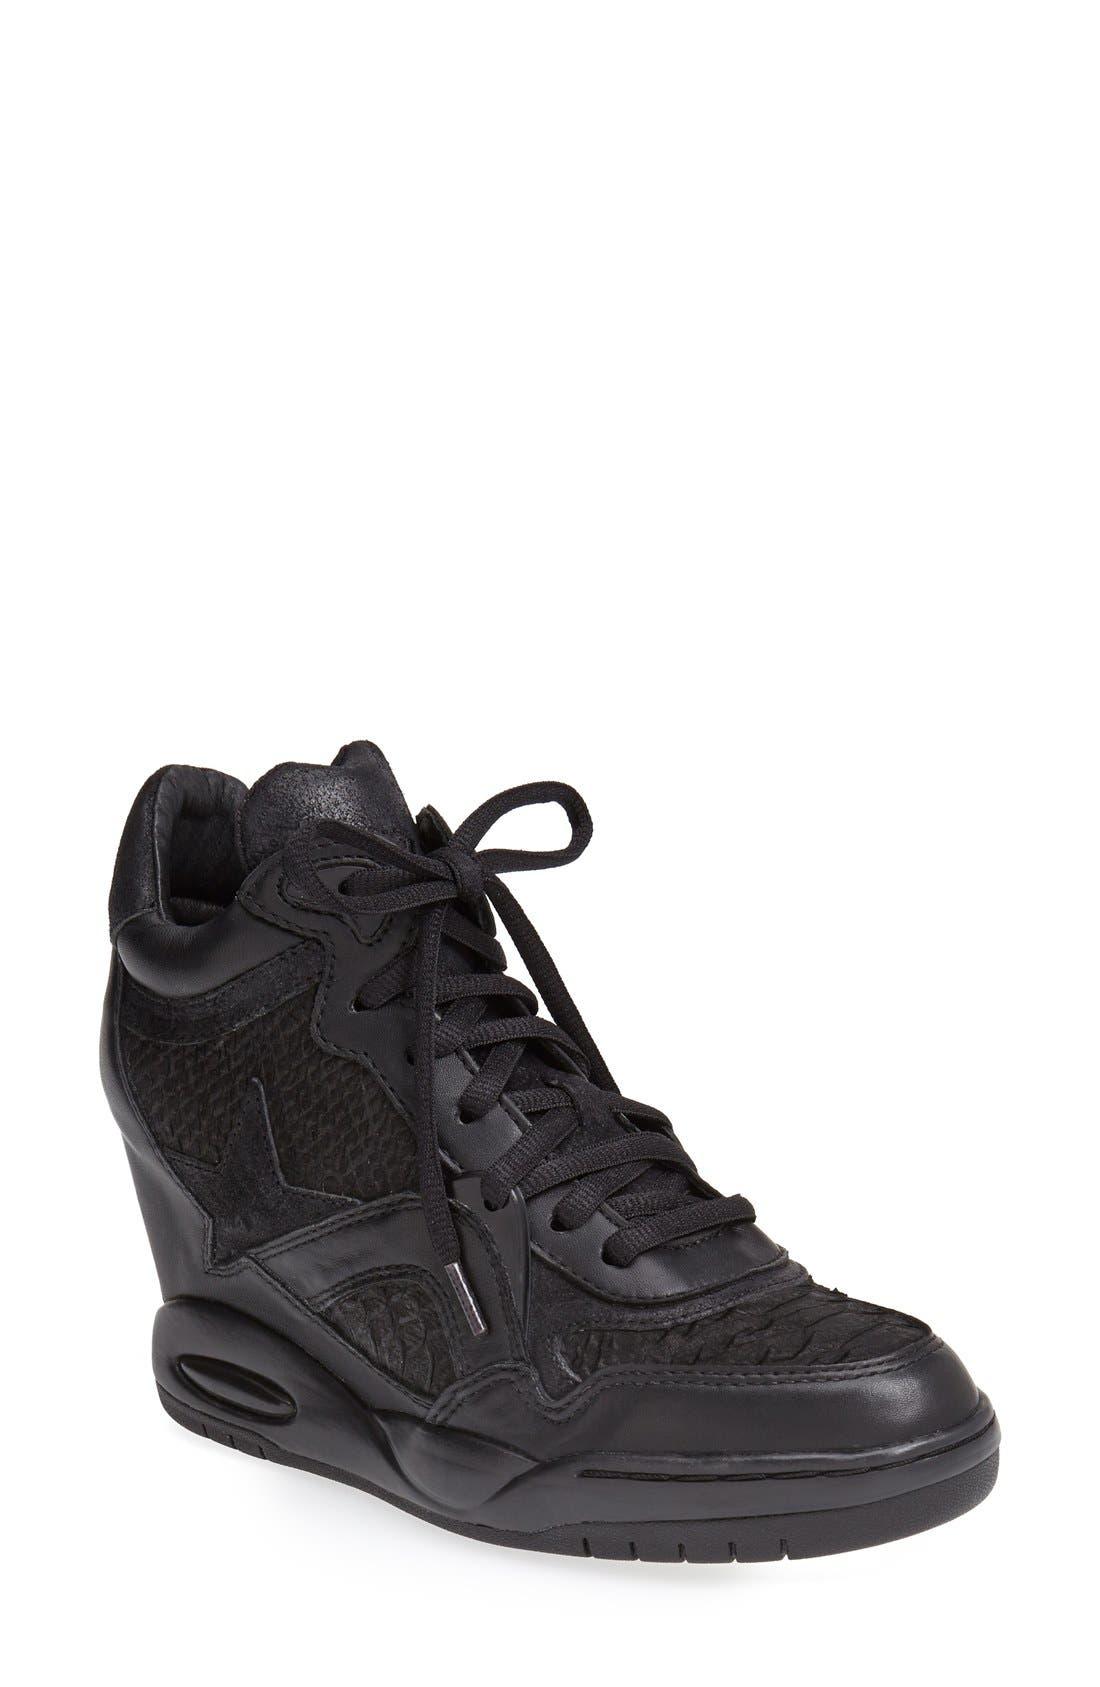 Main Image - Ash 'Bling' Hidden Wedge Sneaker (Women)